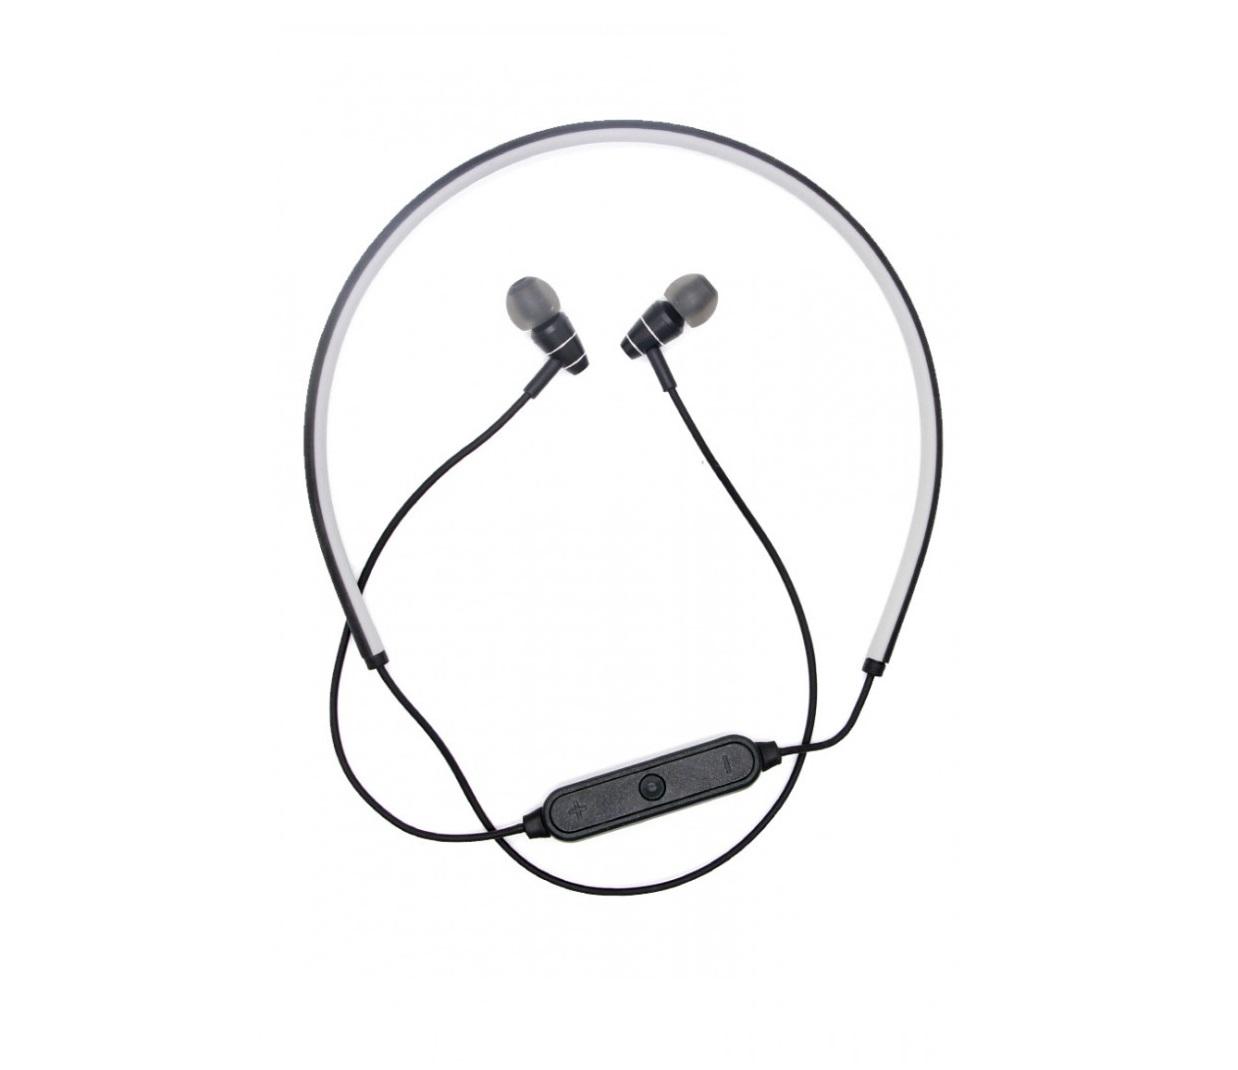 Wireless Headset, Bluetooth, STN-780 Black & Gray